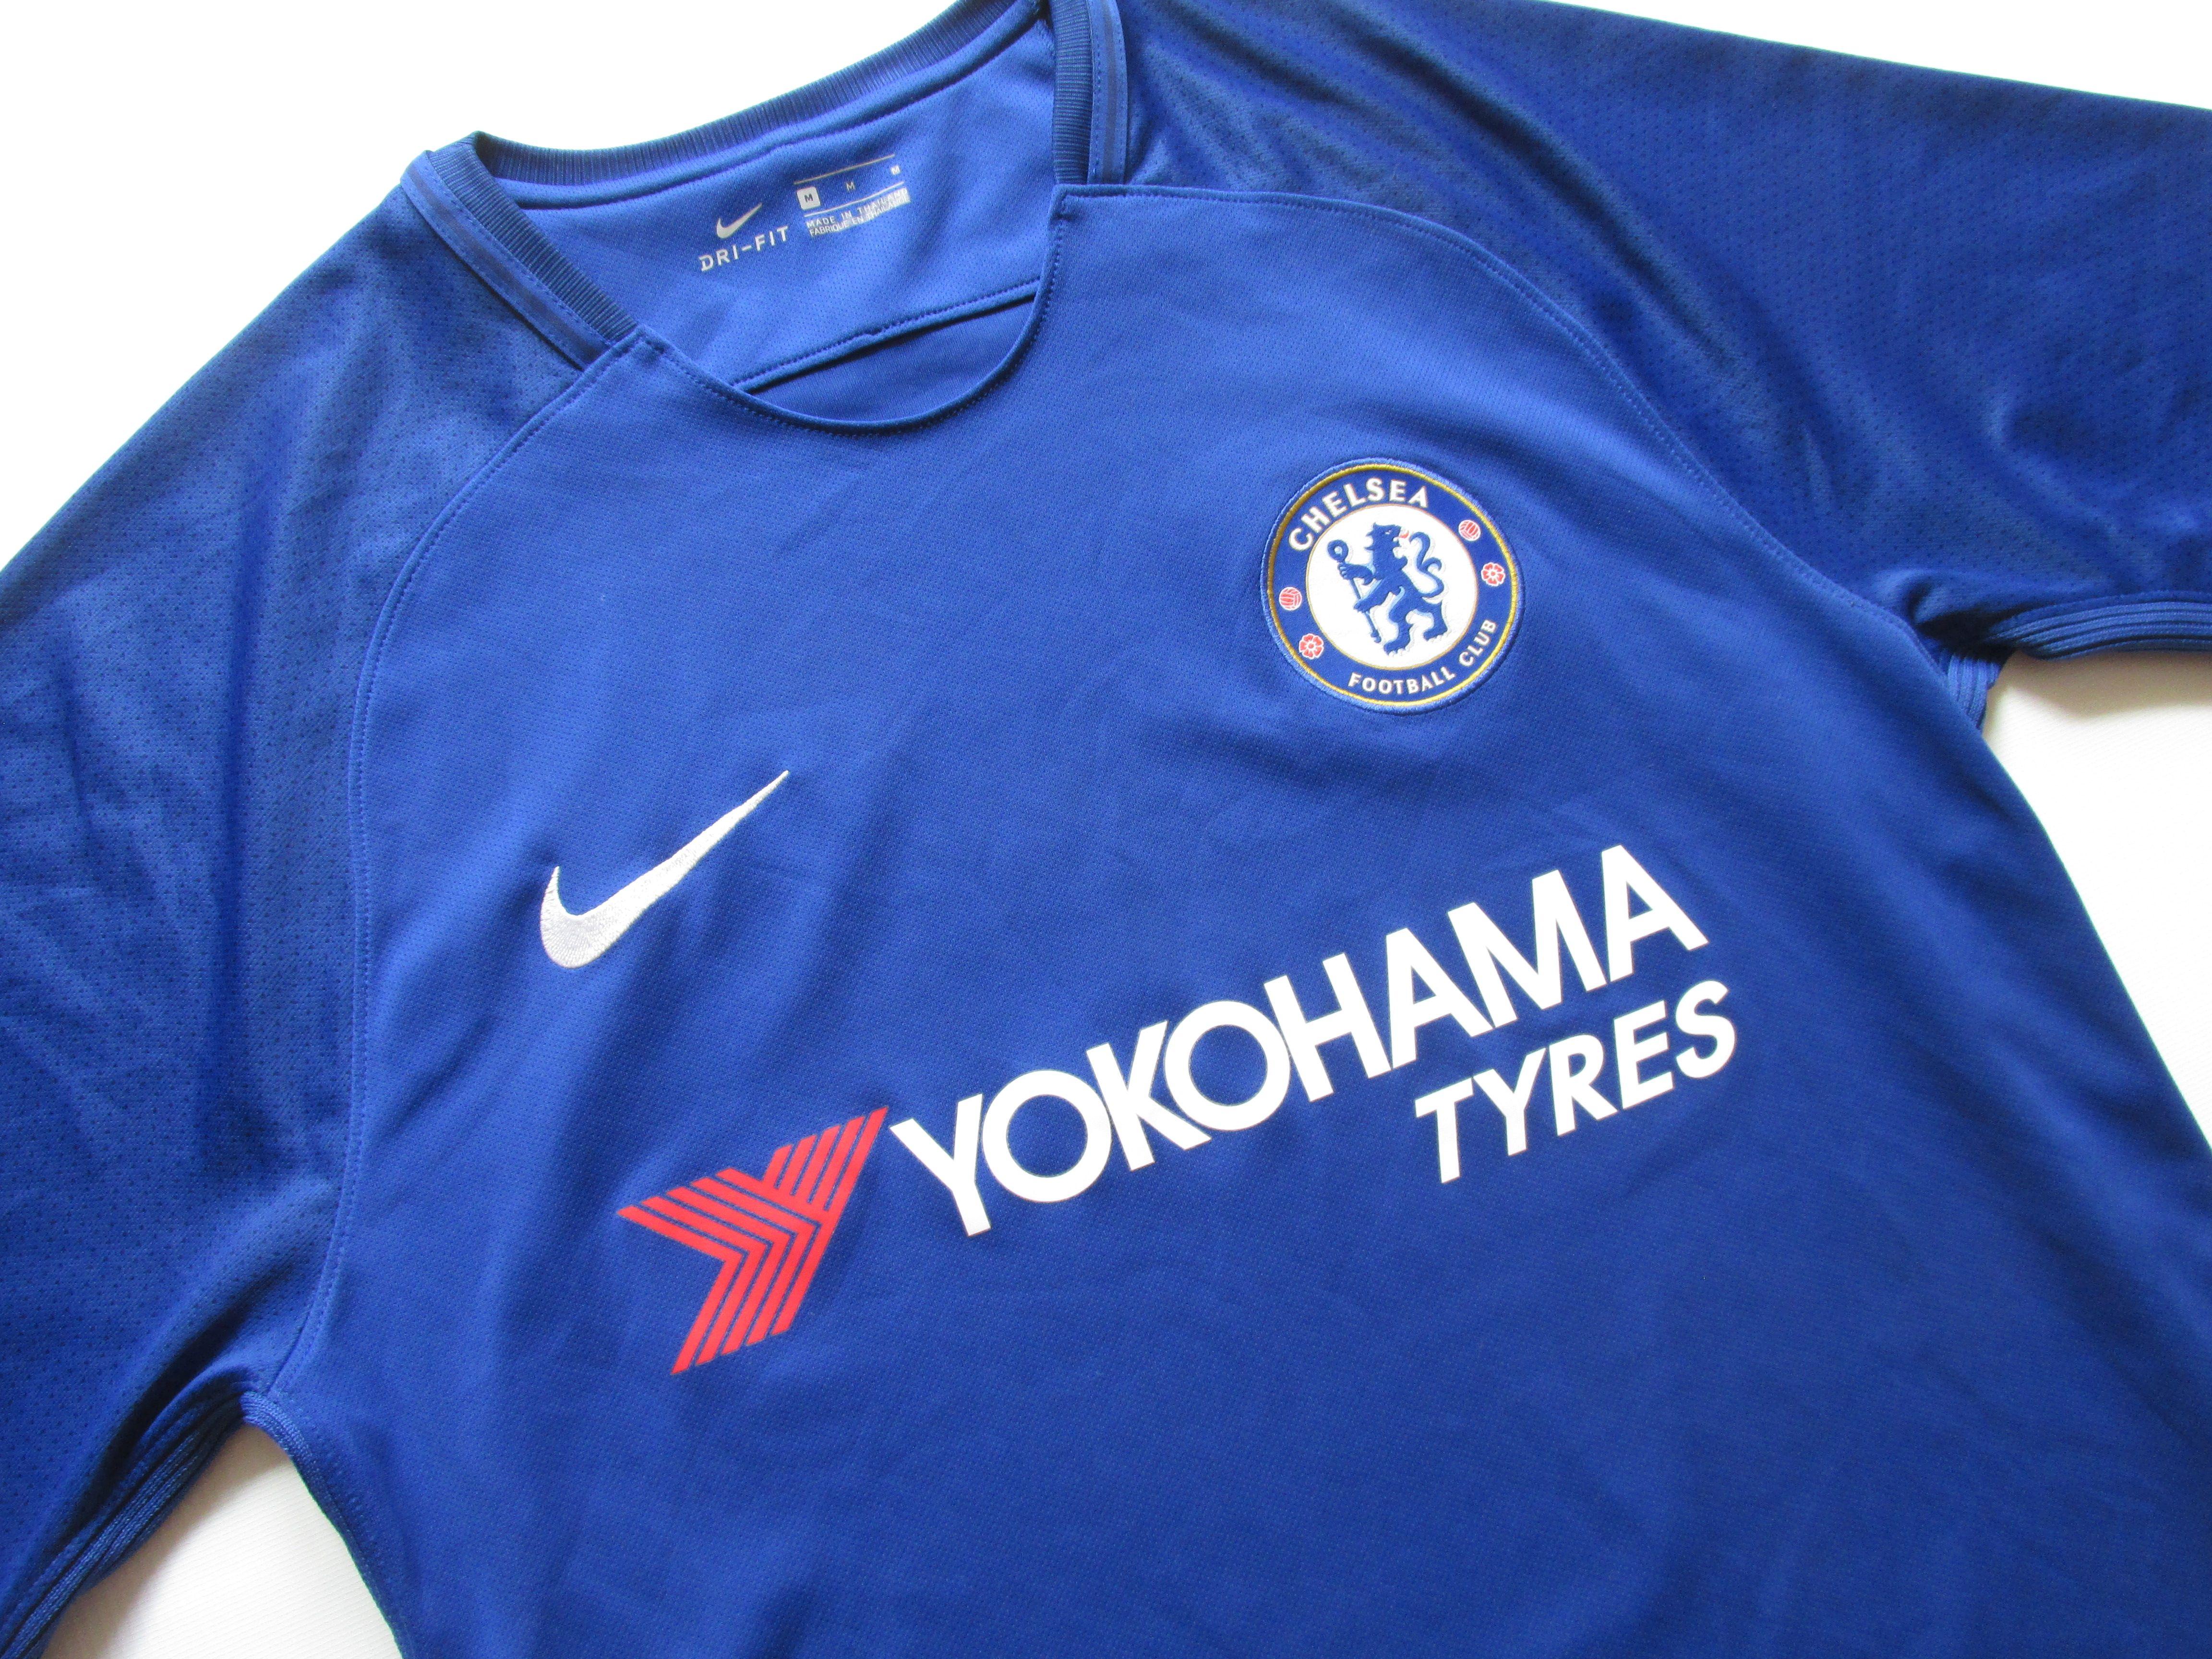 quality design beb8a ddd9e Chelsea 2017/2018 home football shirt by Nike CFC London ...